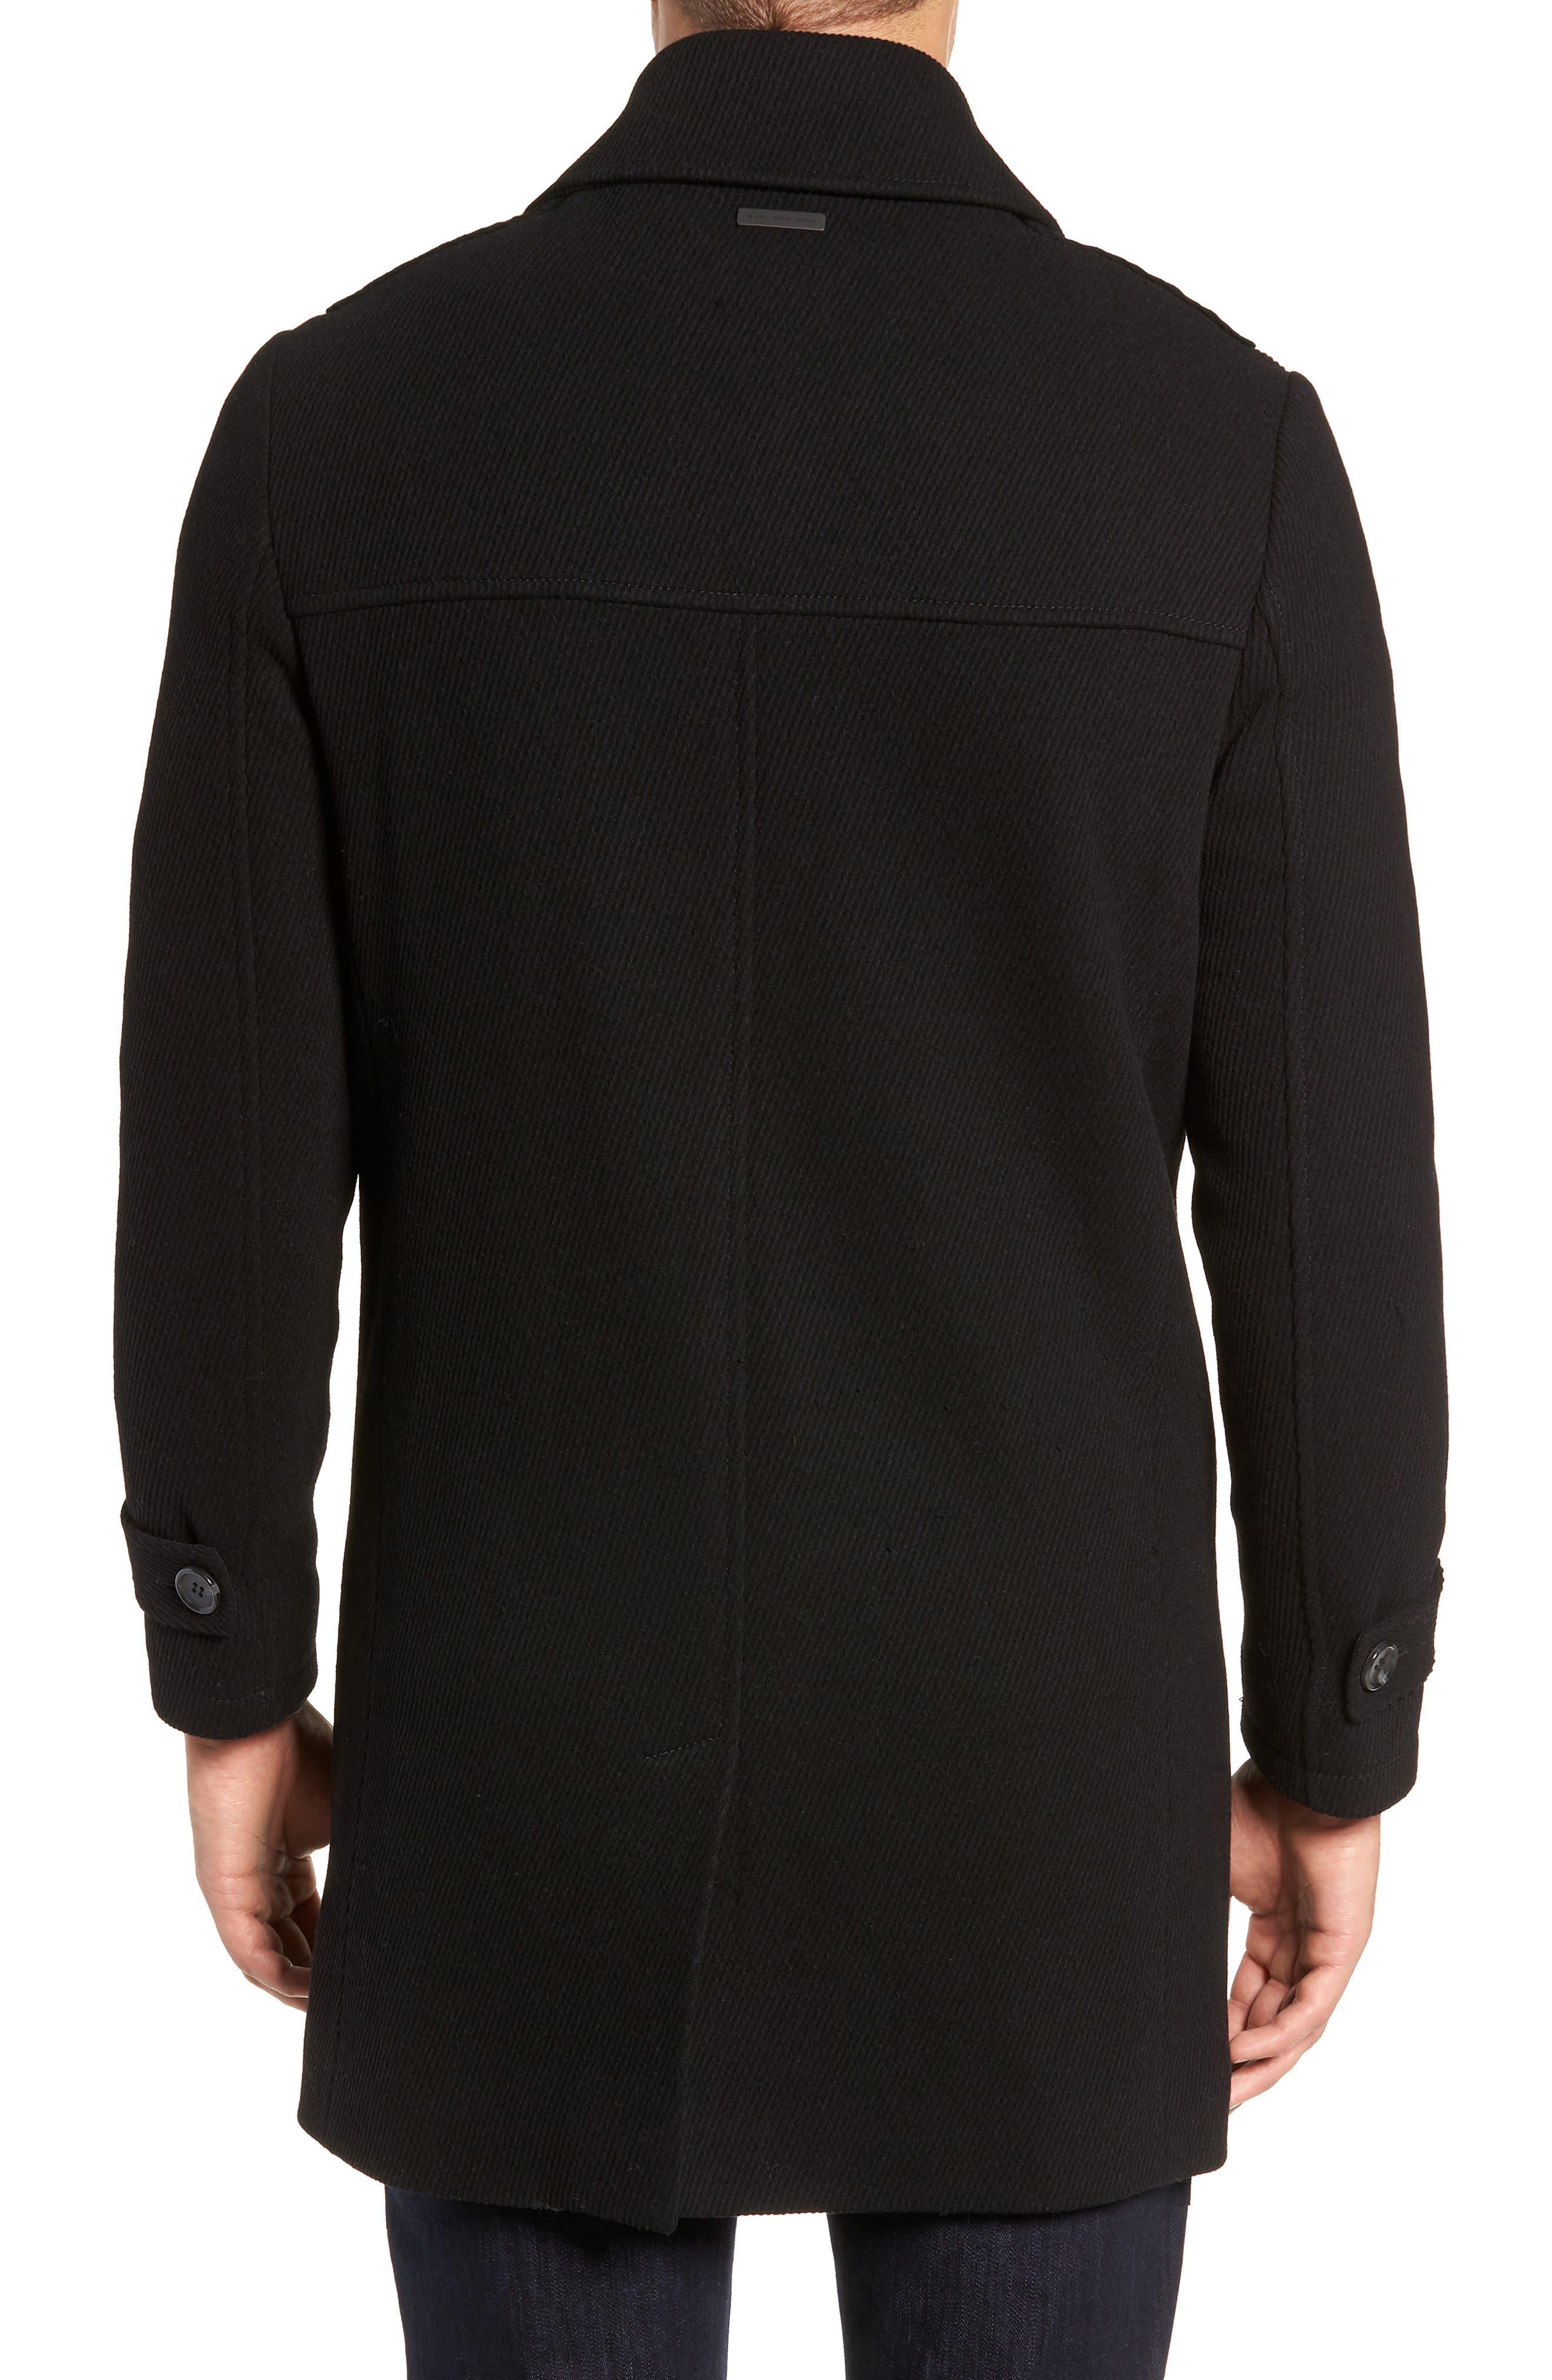 MARC NEW YORK, Edmund Wool Blend Twill Car Coat, Alternate thumbnail 2, color, BLACK